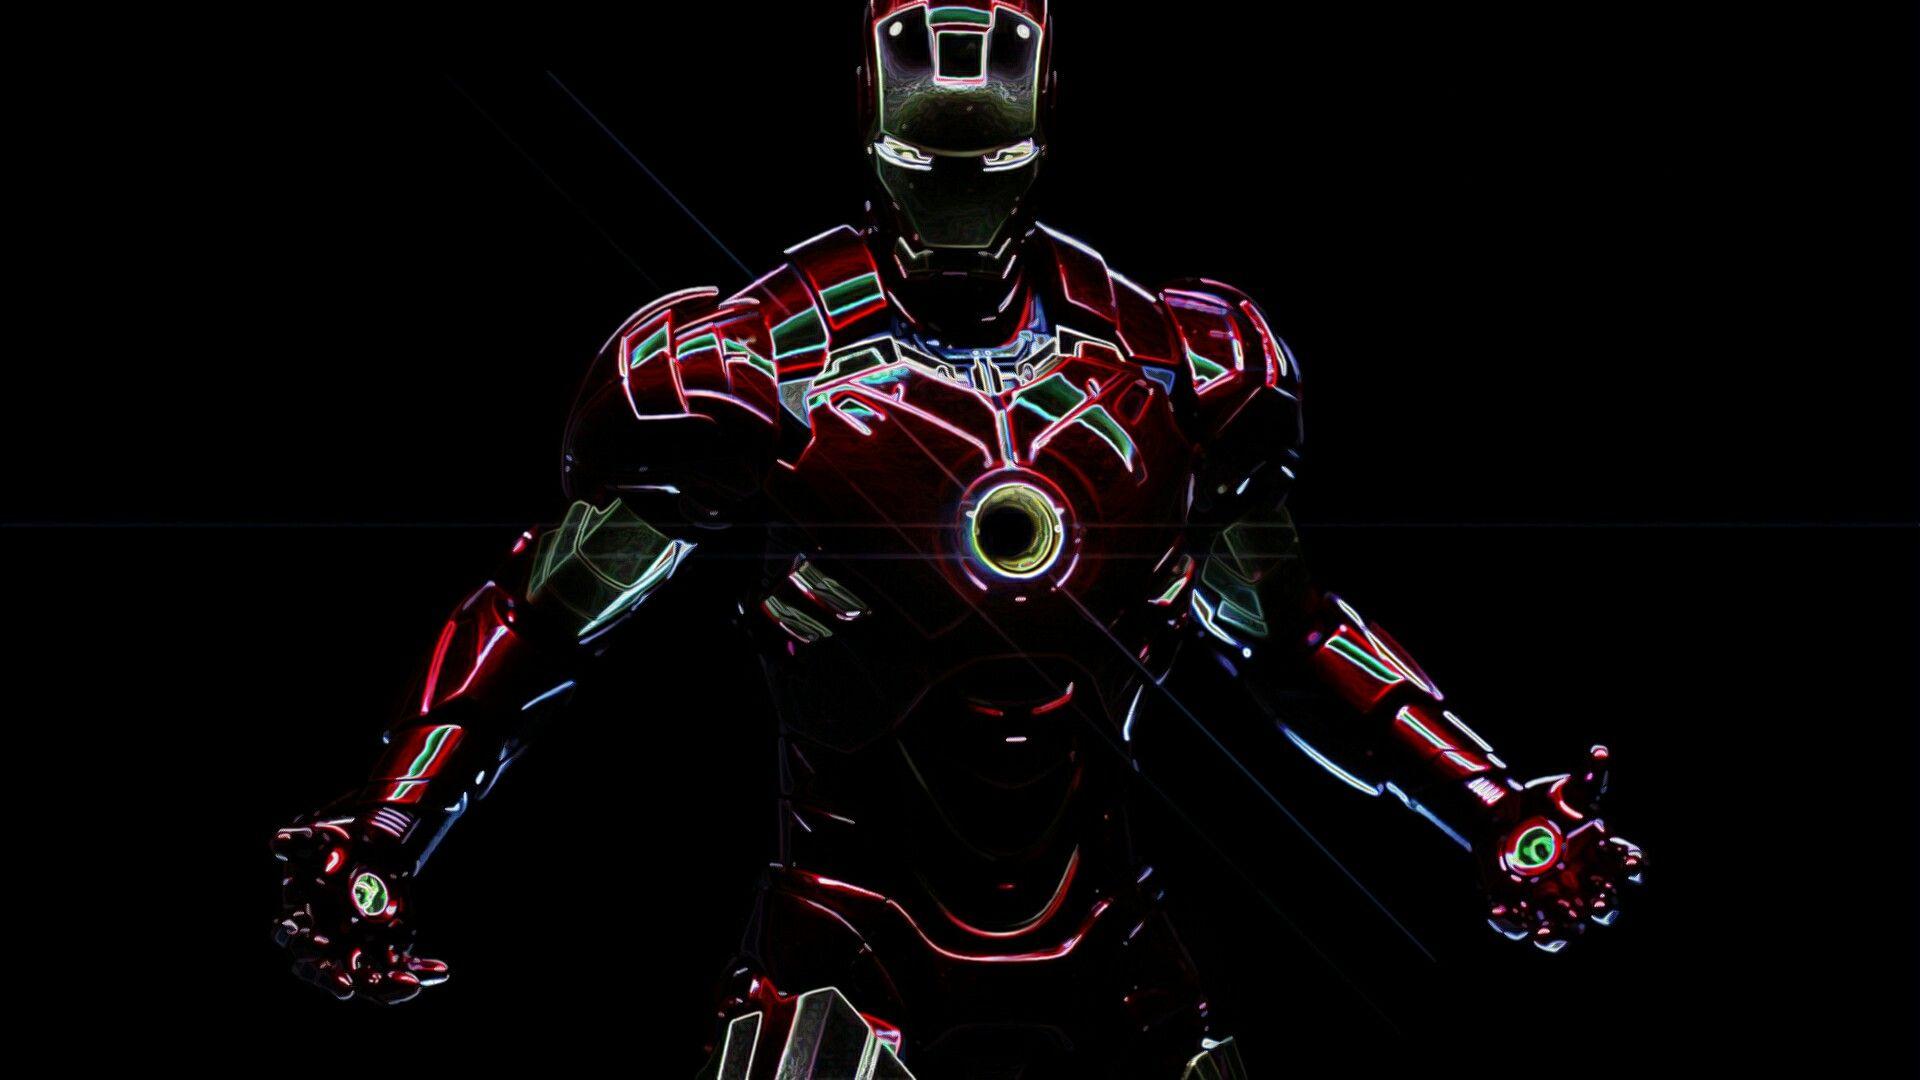 Iron Man Neon Iron Man Hd Wallpaper Iron Man Hd Images Iron Man Wallpaper